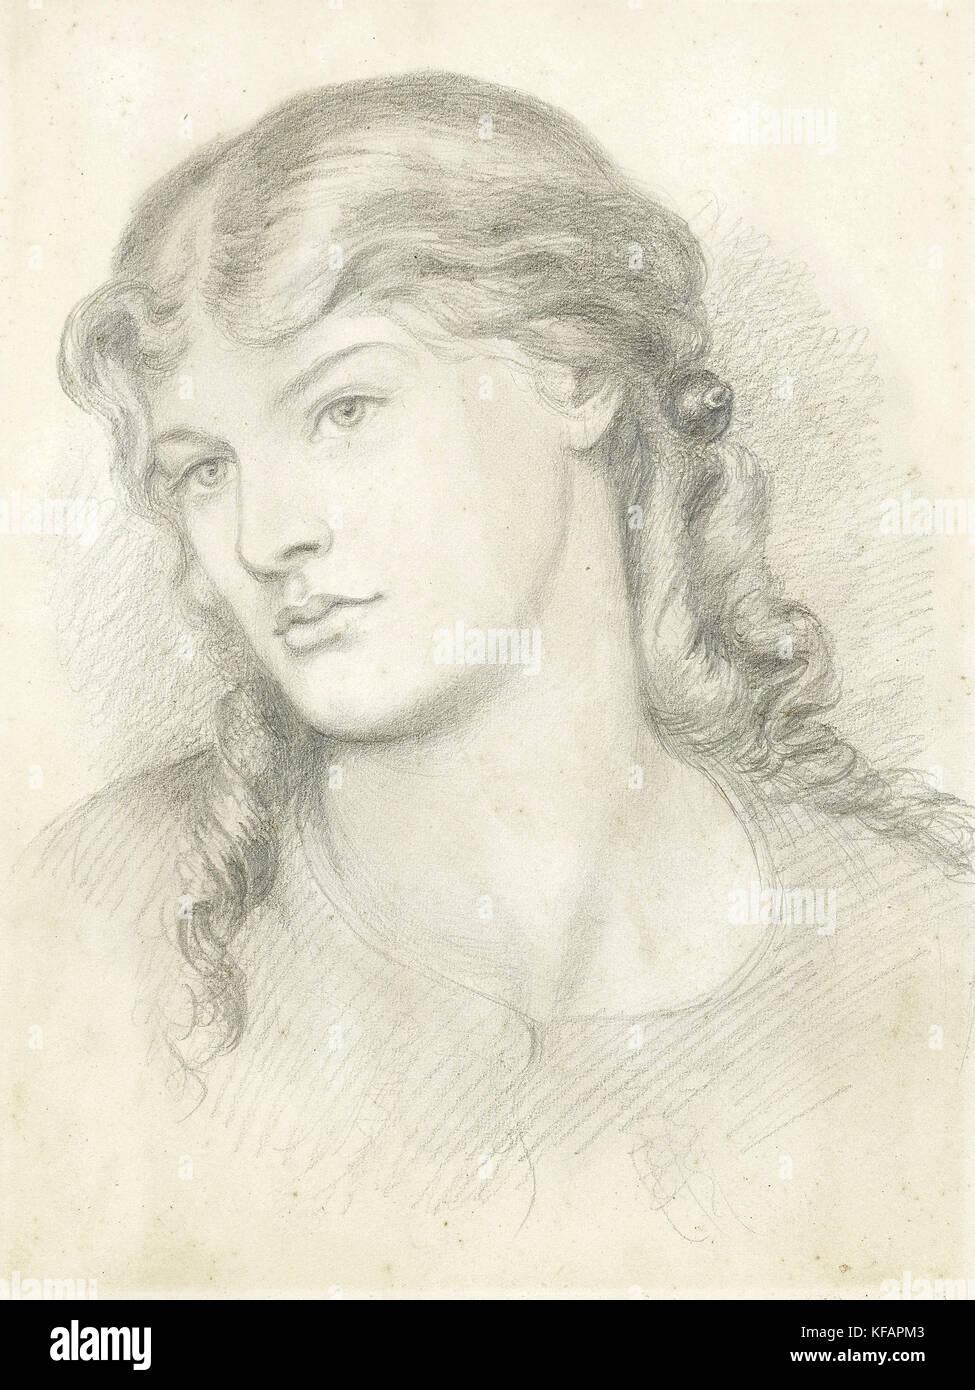 Alexa Wilding, by Dante Gabriel Rossetti, 1865 - Stock Image